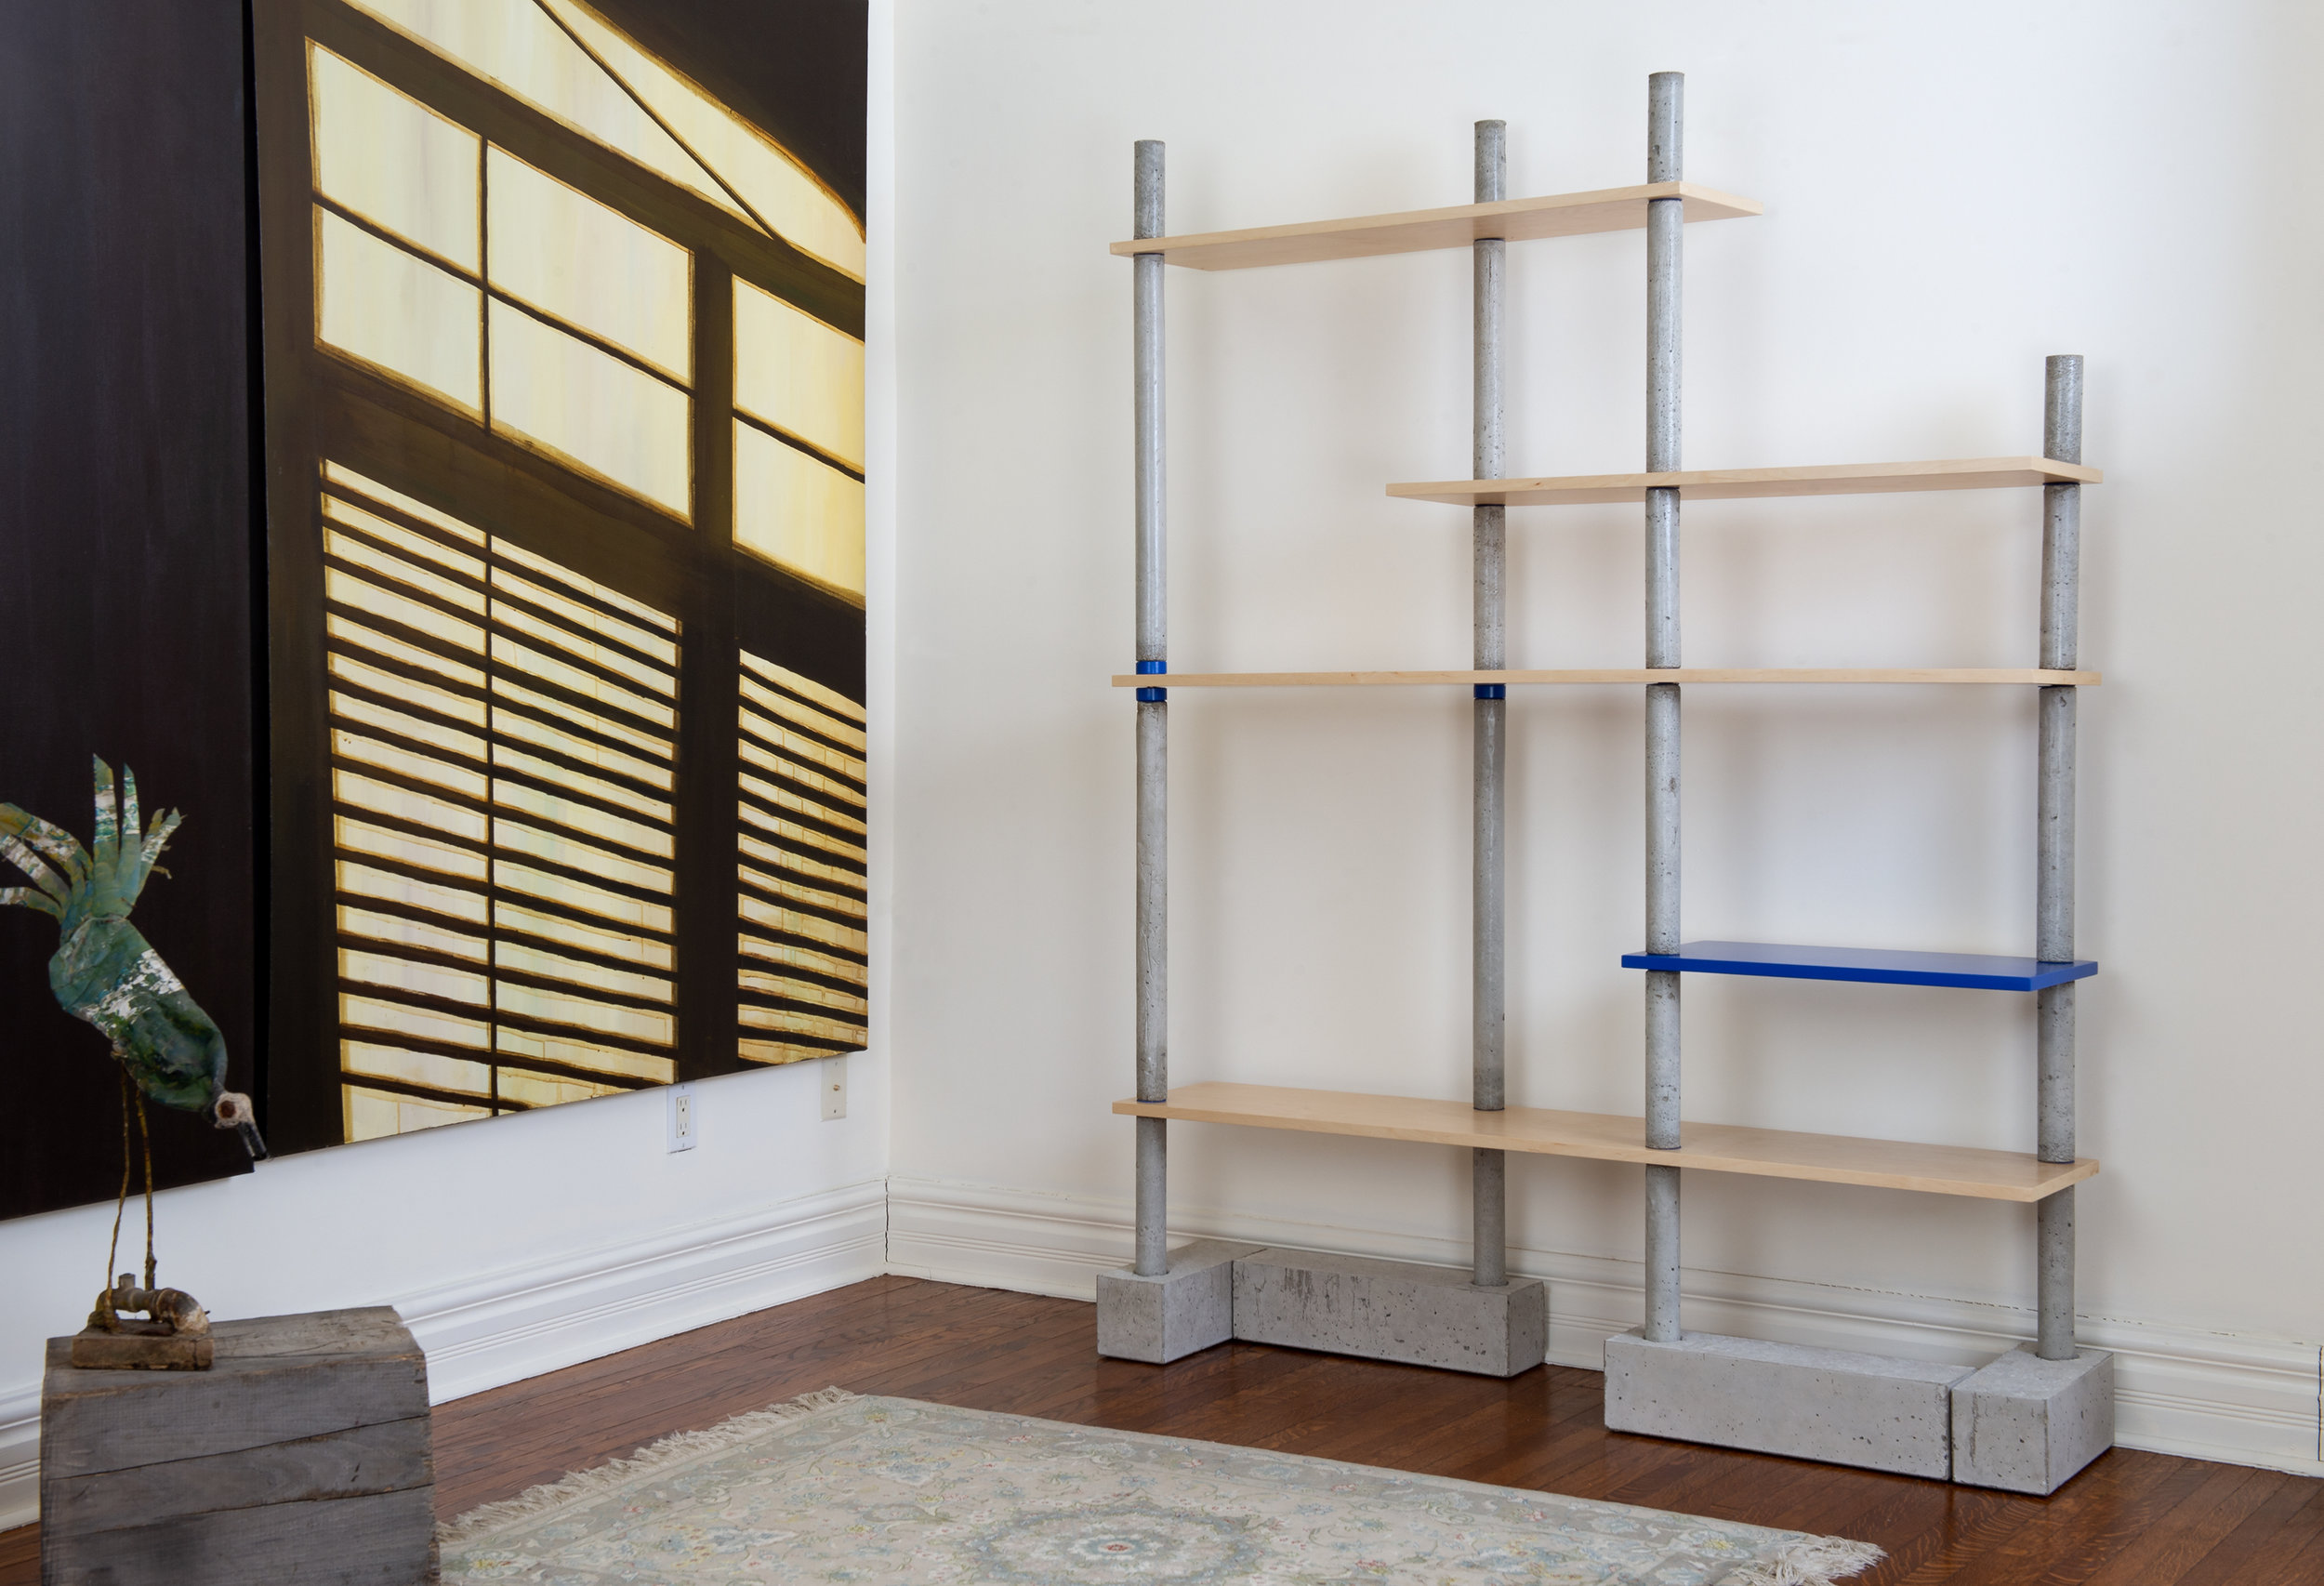 LALAYA Design - BIM BOM Bookshelf - concrete-maple-bookcase-collectible design